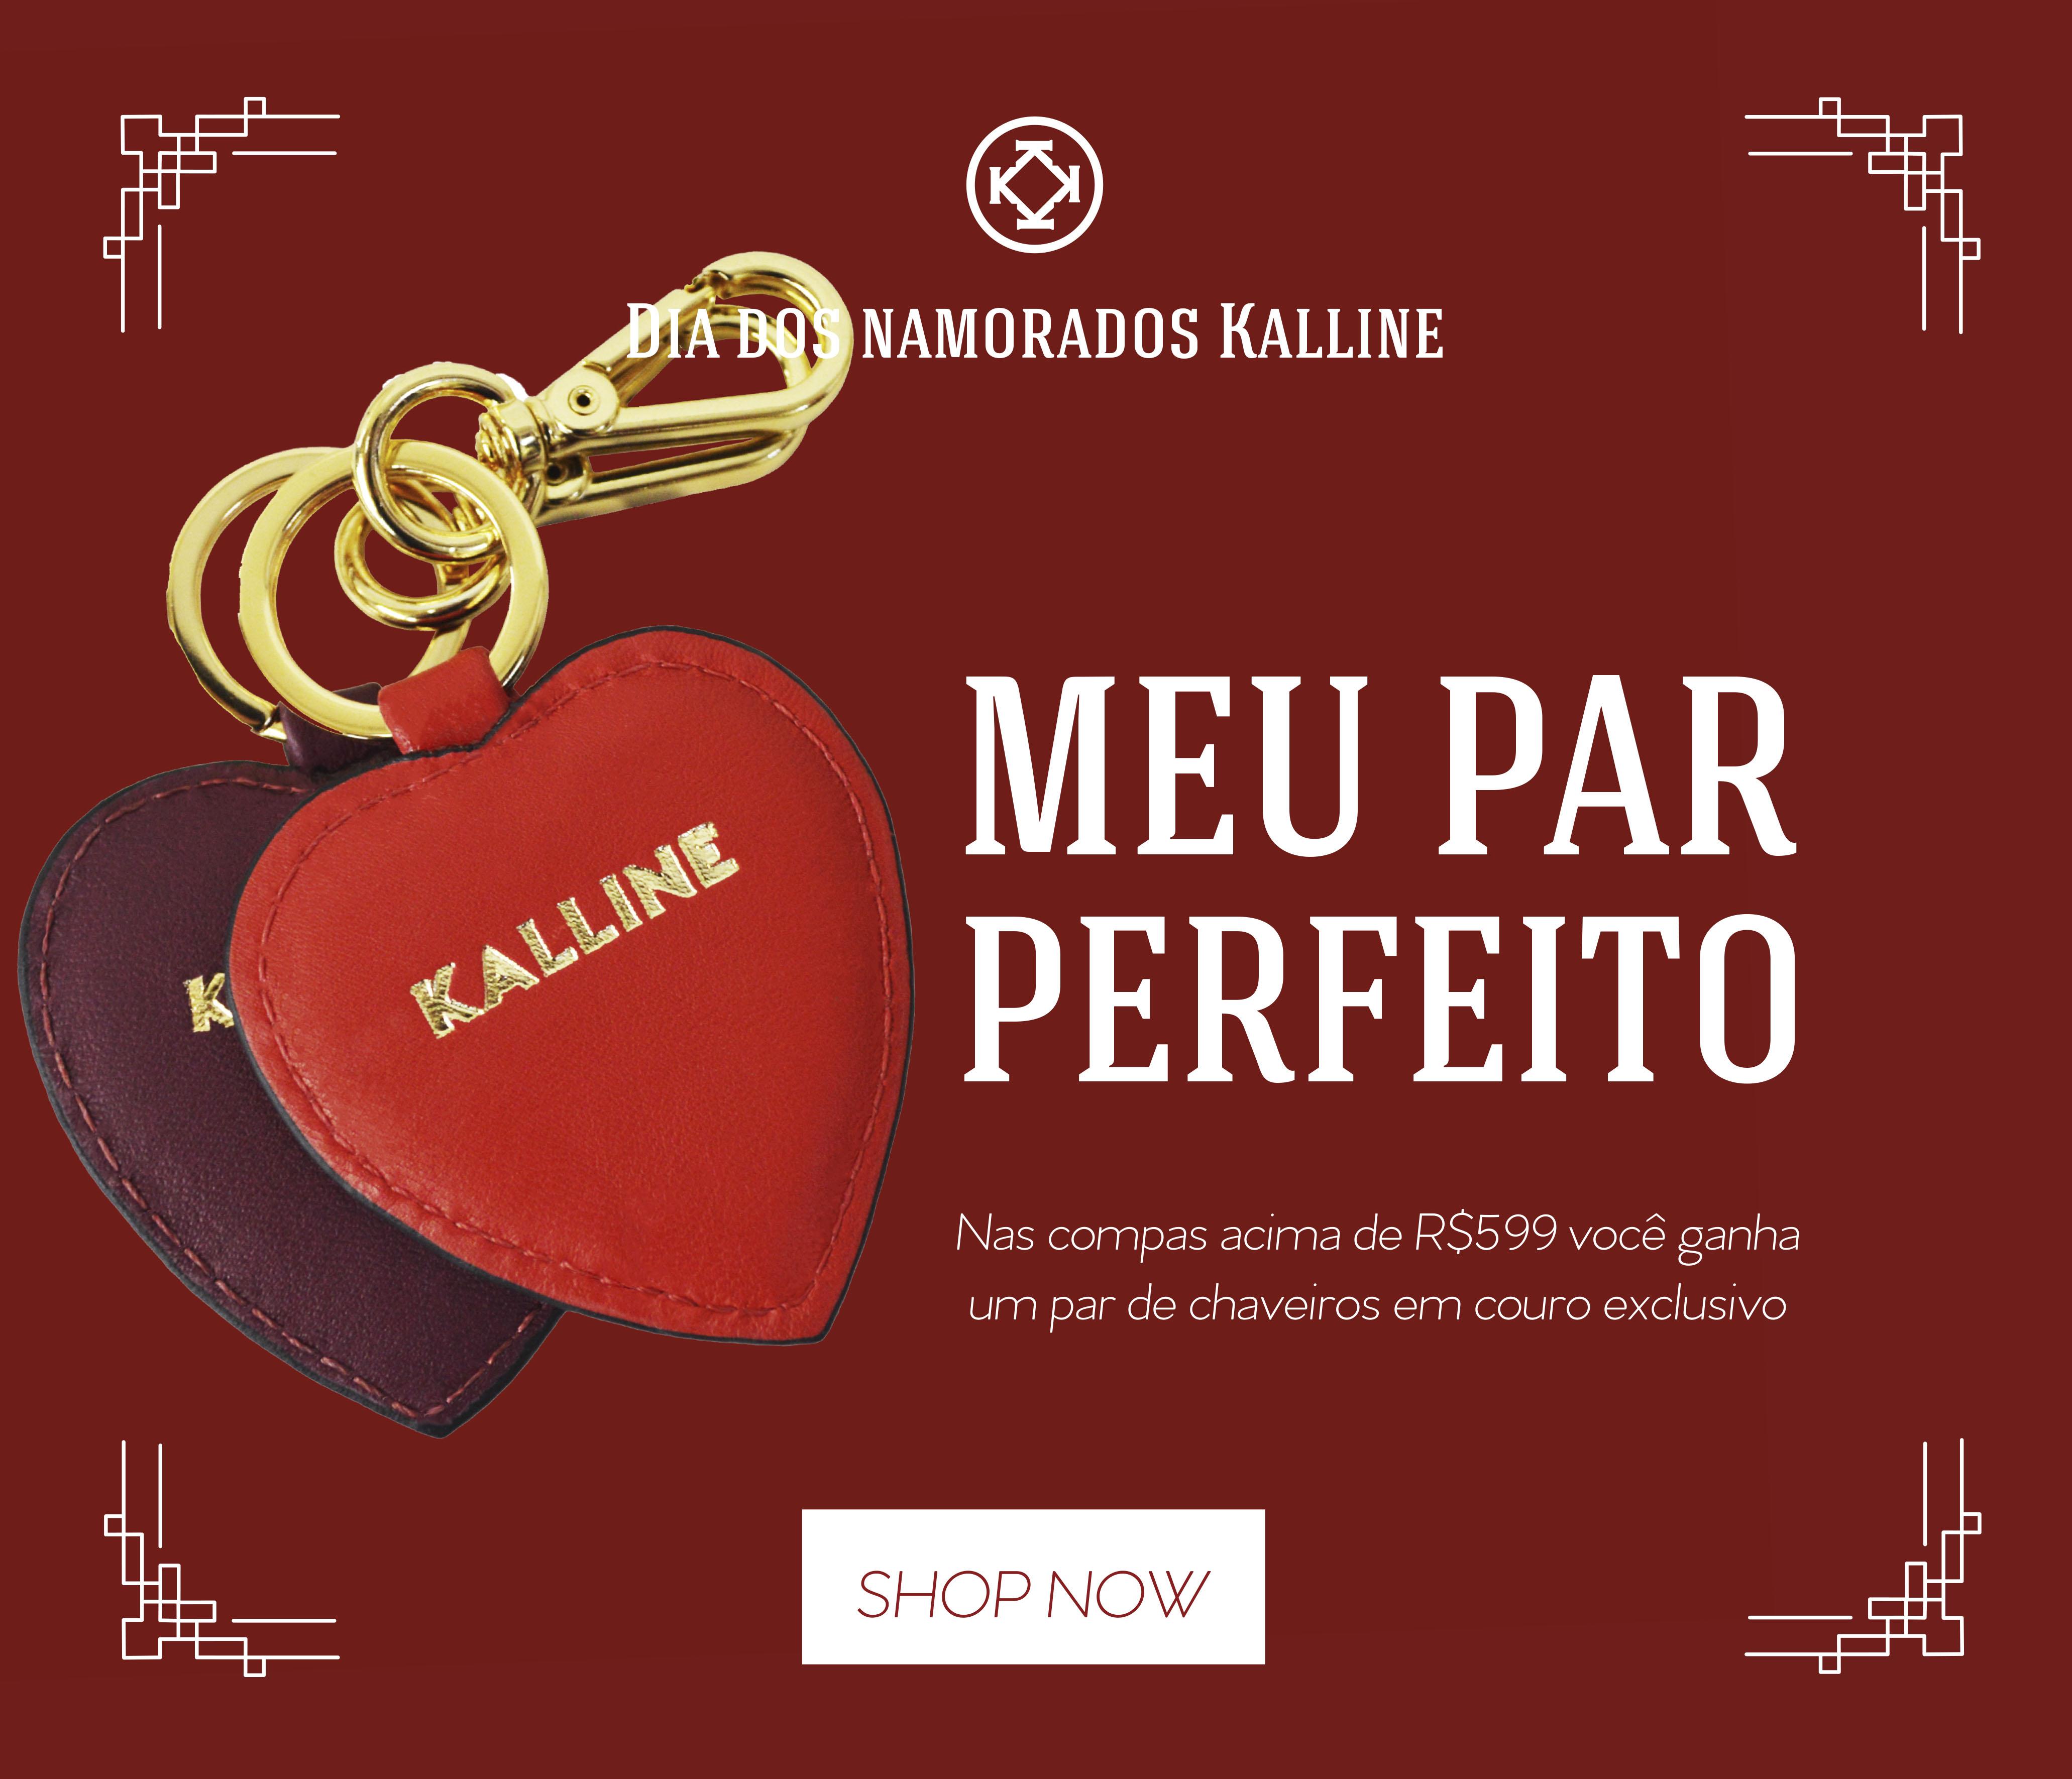 Dia dos Namorados Kalline